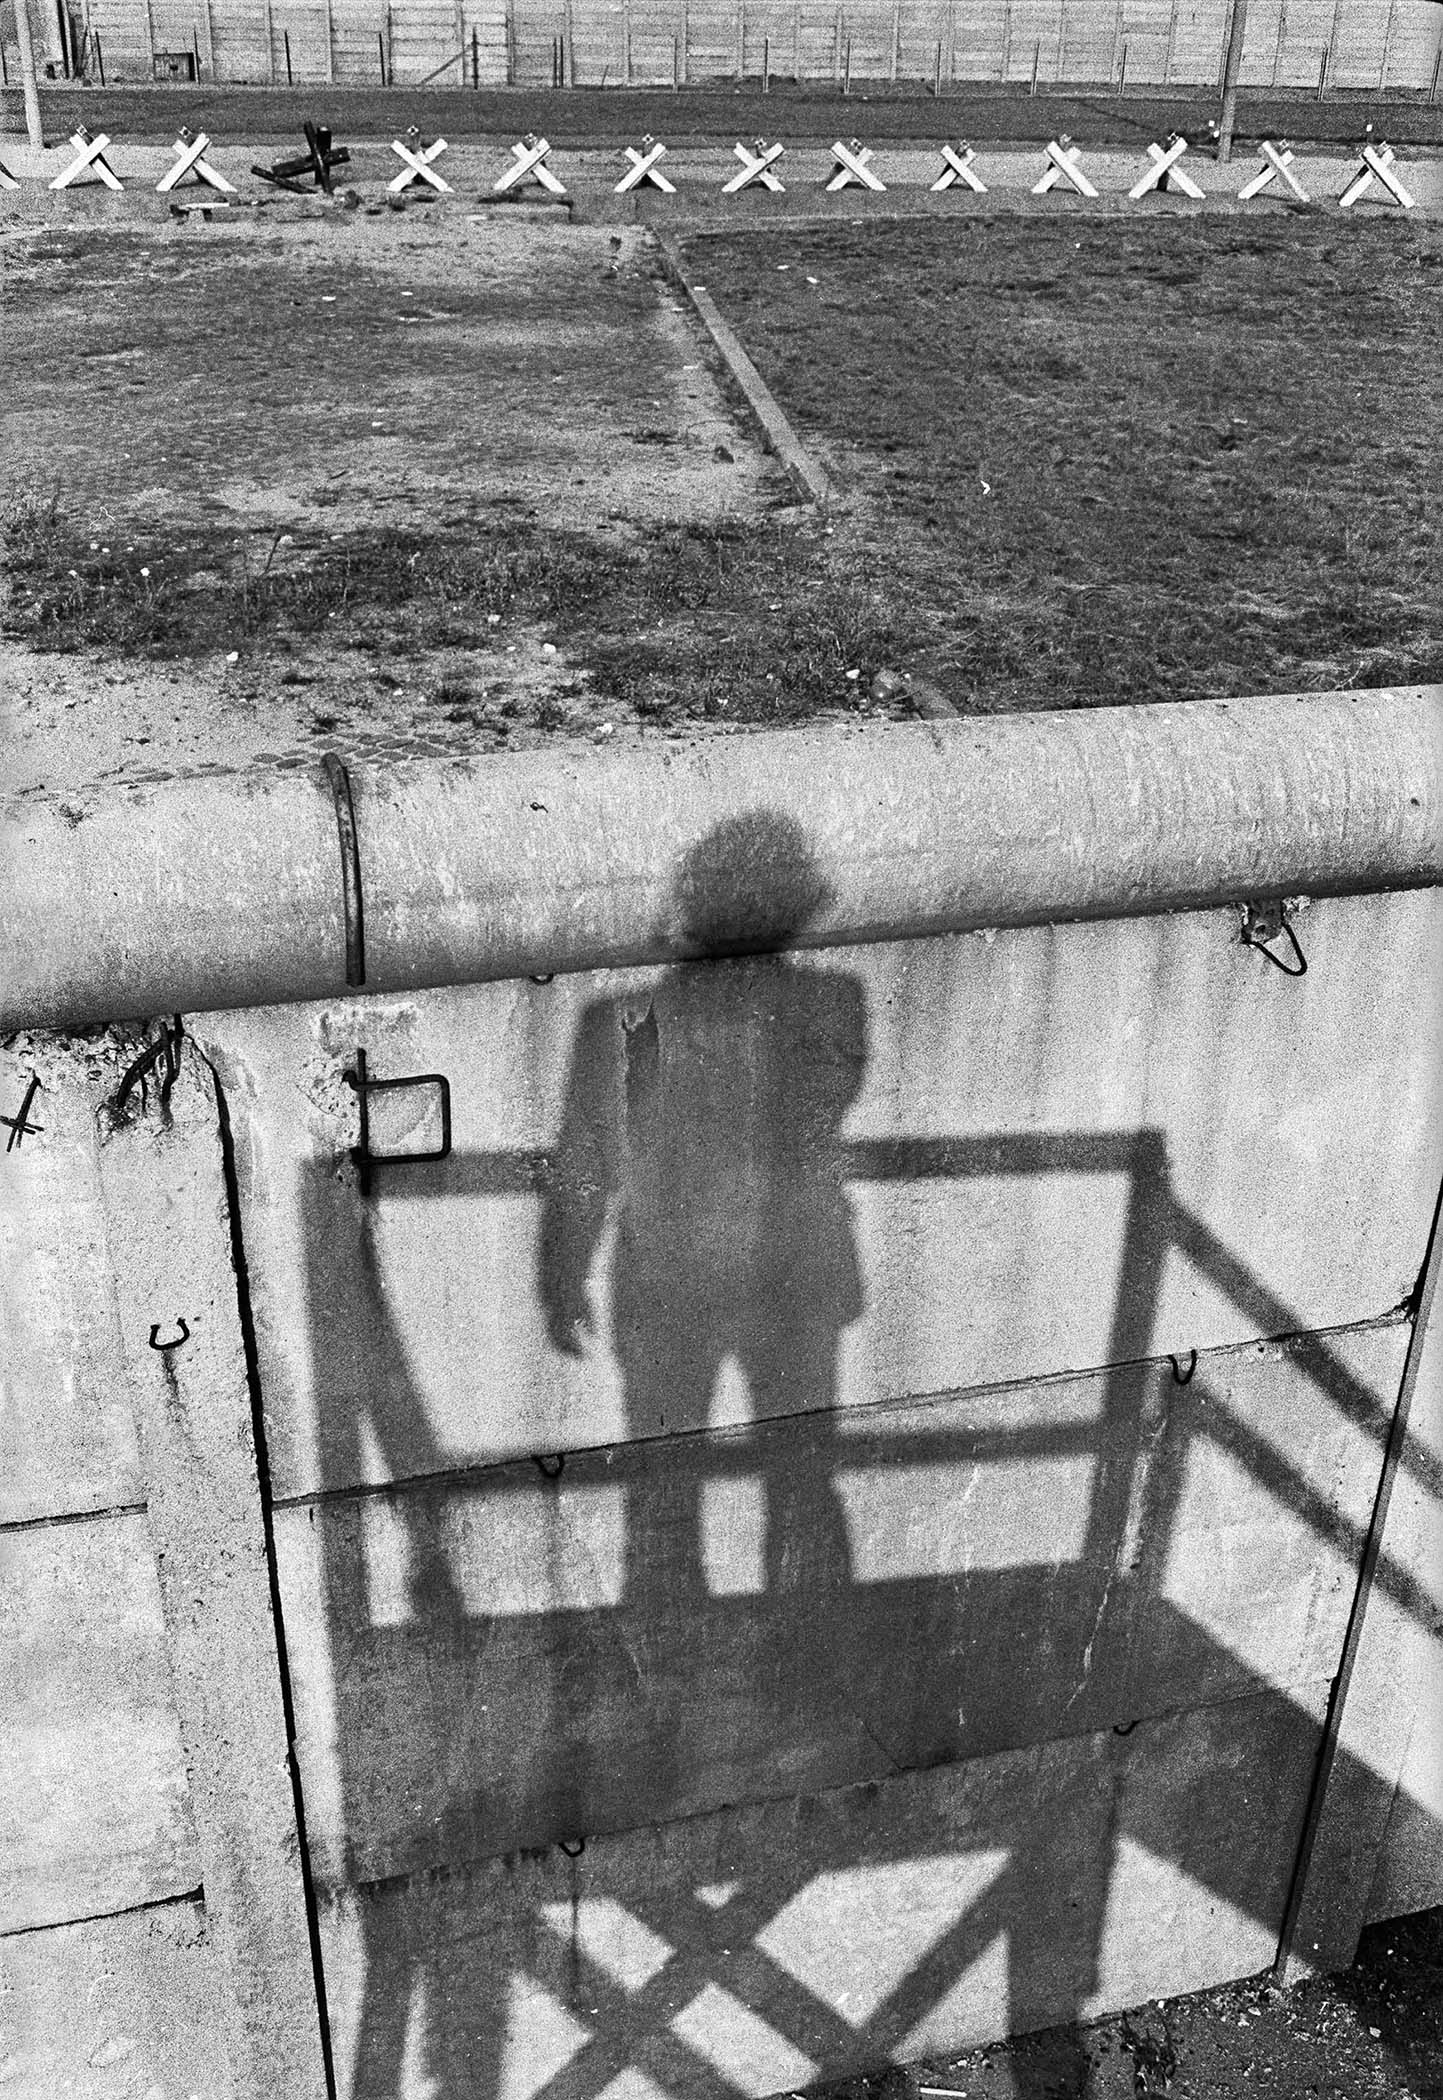 berlin3_26. Shadow on Berlin Wall (looking east),1974